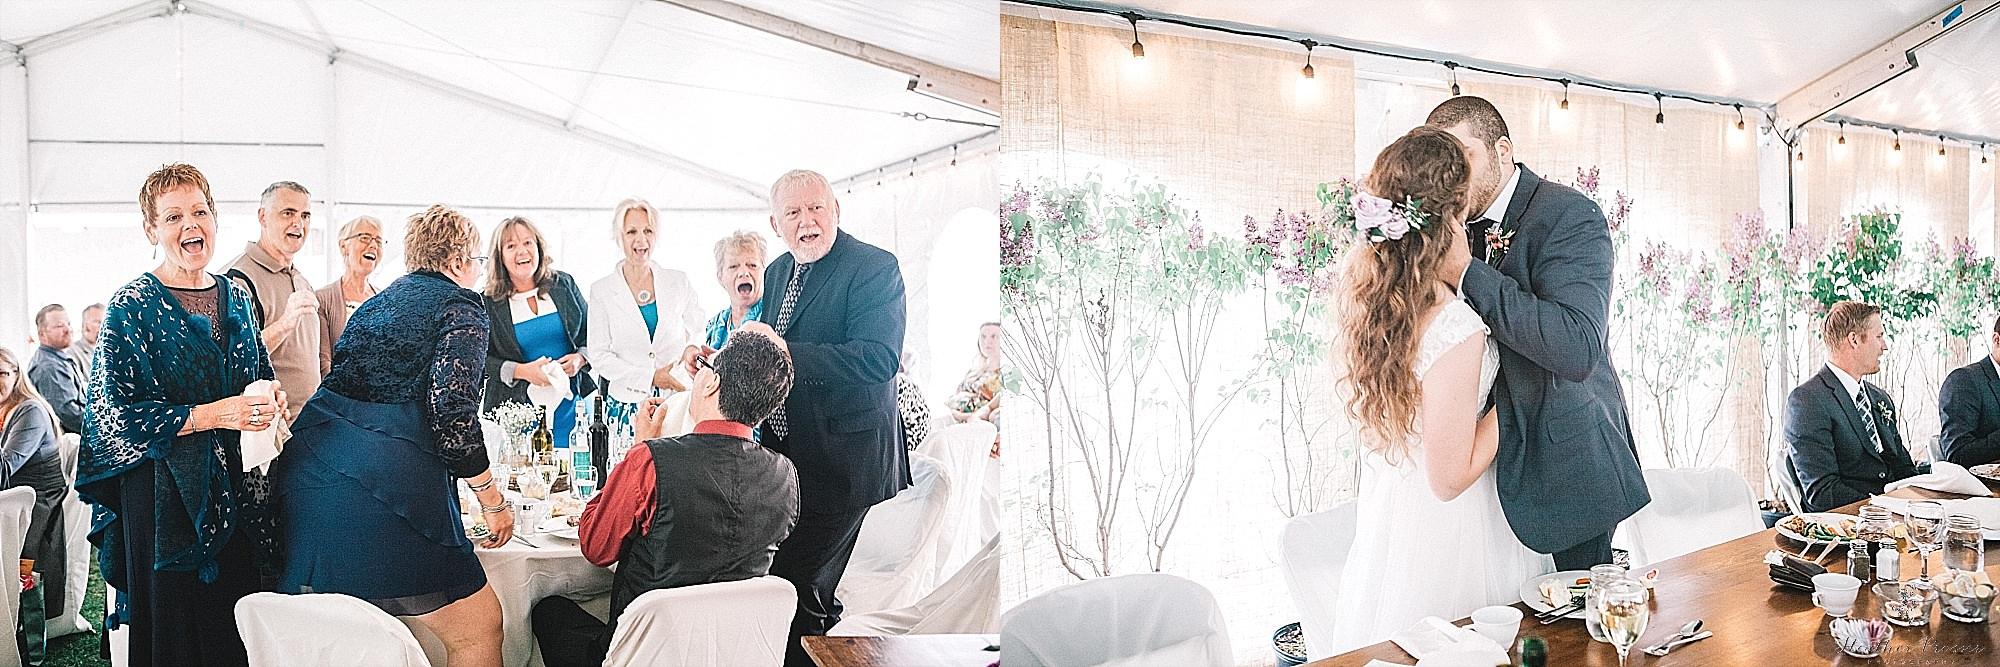 Destination Wedding_0217.jpg